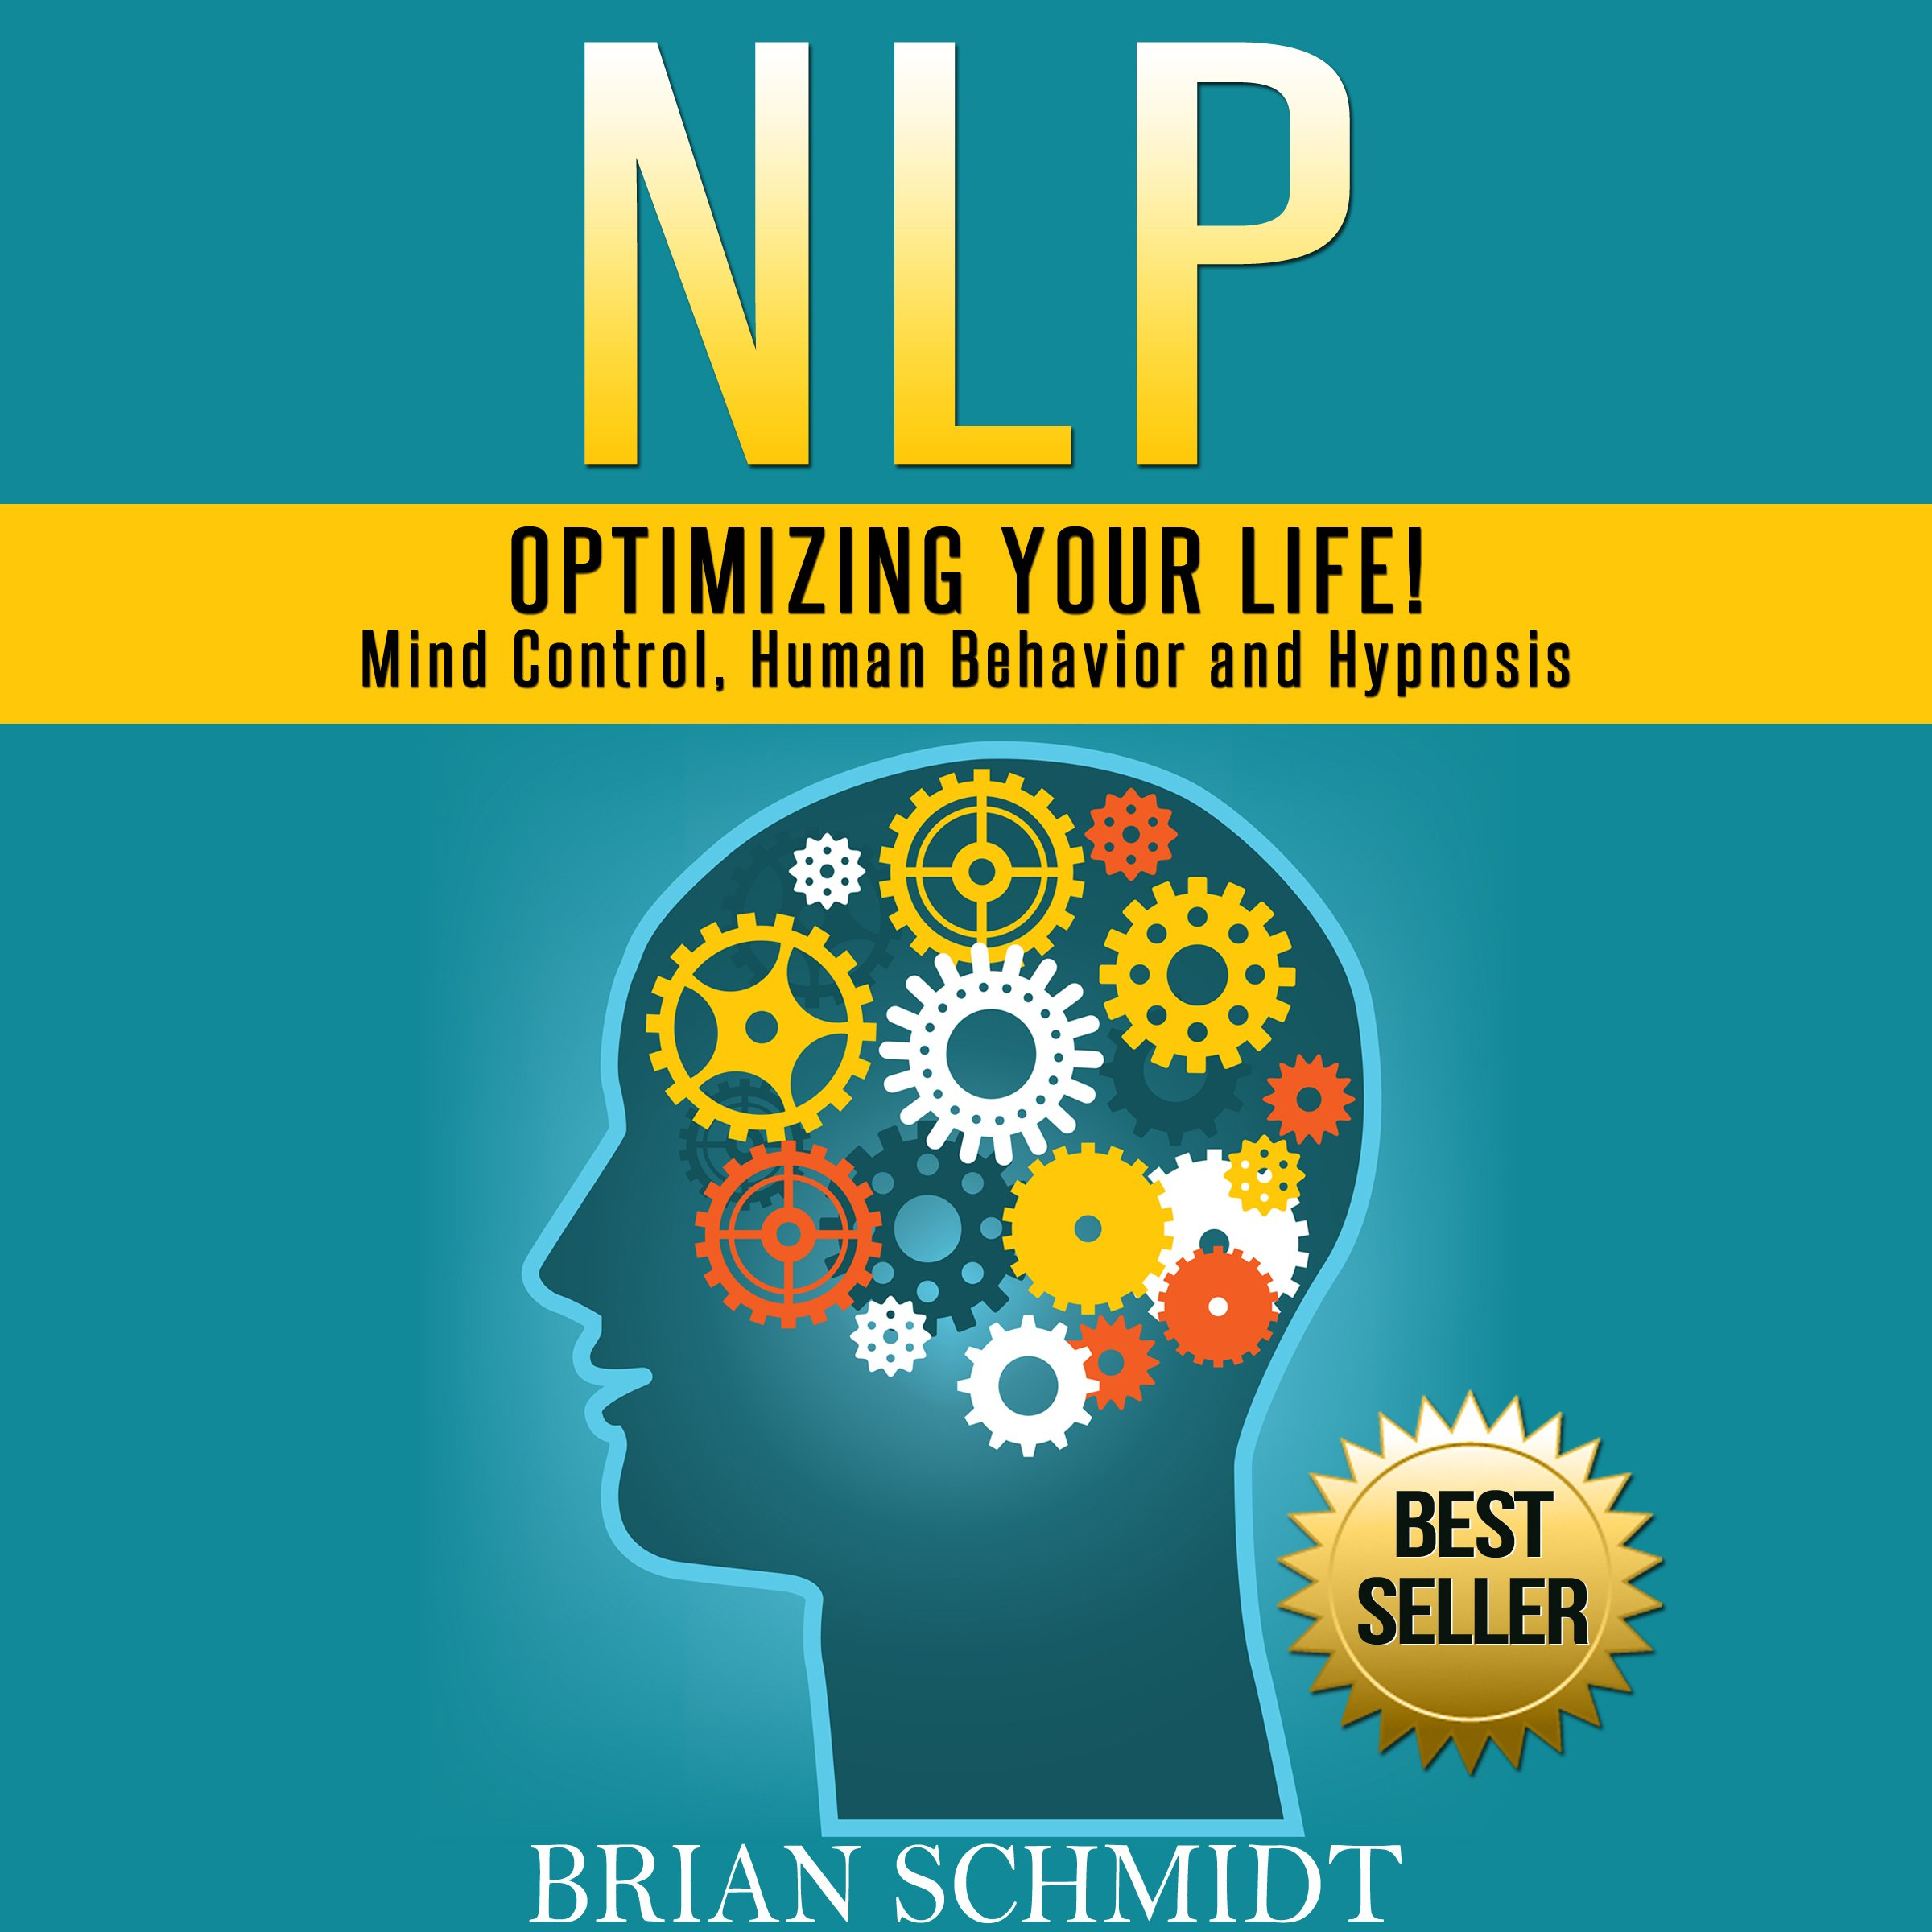 NLP: Optimizing Your Life!: Mind Control, Human Behavior and Hypnosis